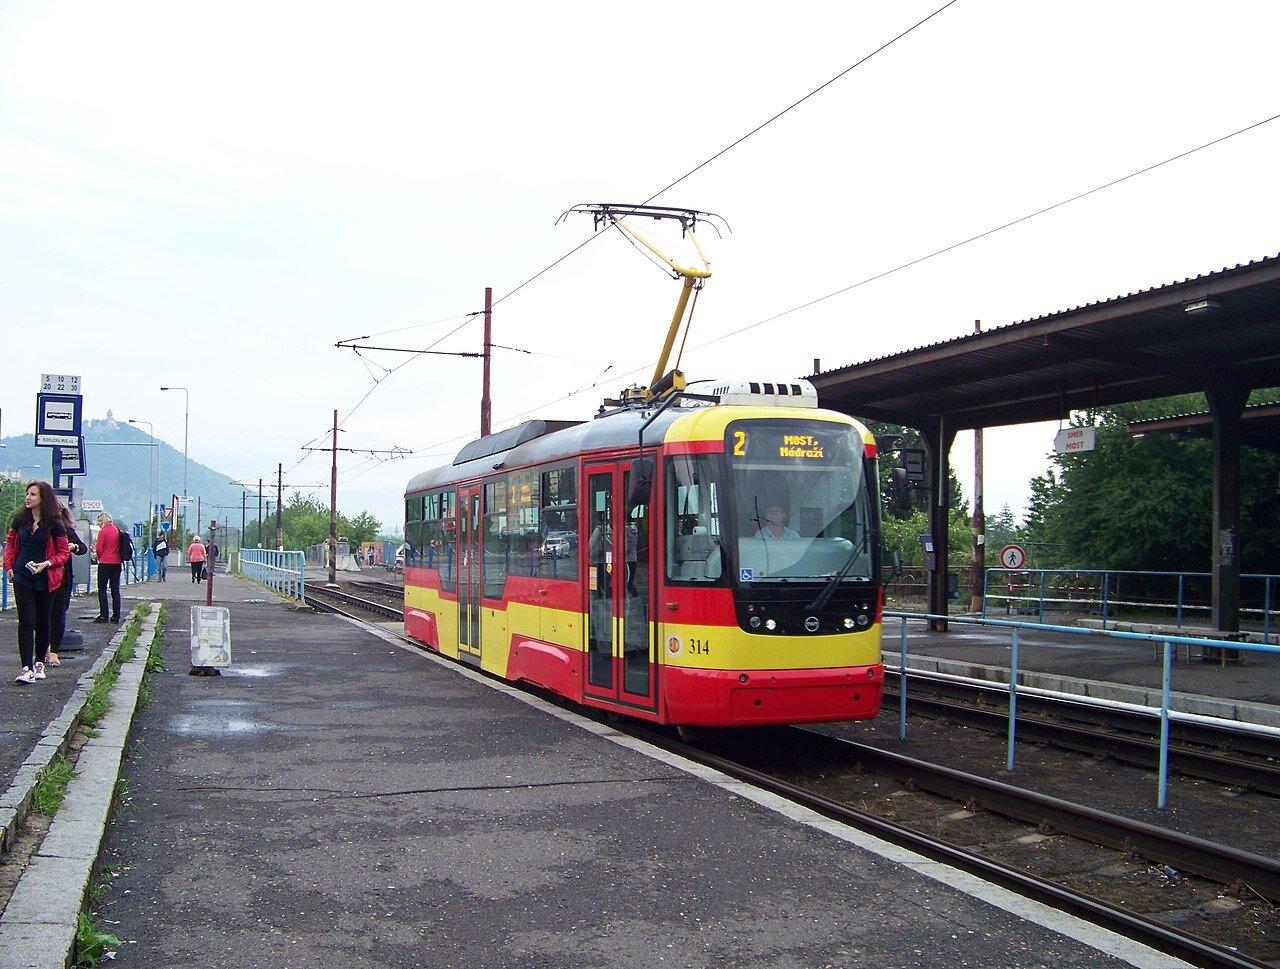 Tramvaj VarioLF+ ev. č. 314 na výstupní zastávce v Mostě u nádraží. (zdroj: Wikipedie.org, foto: ŠJů)